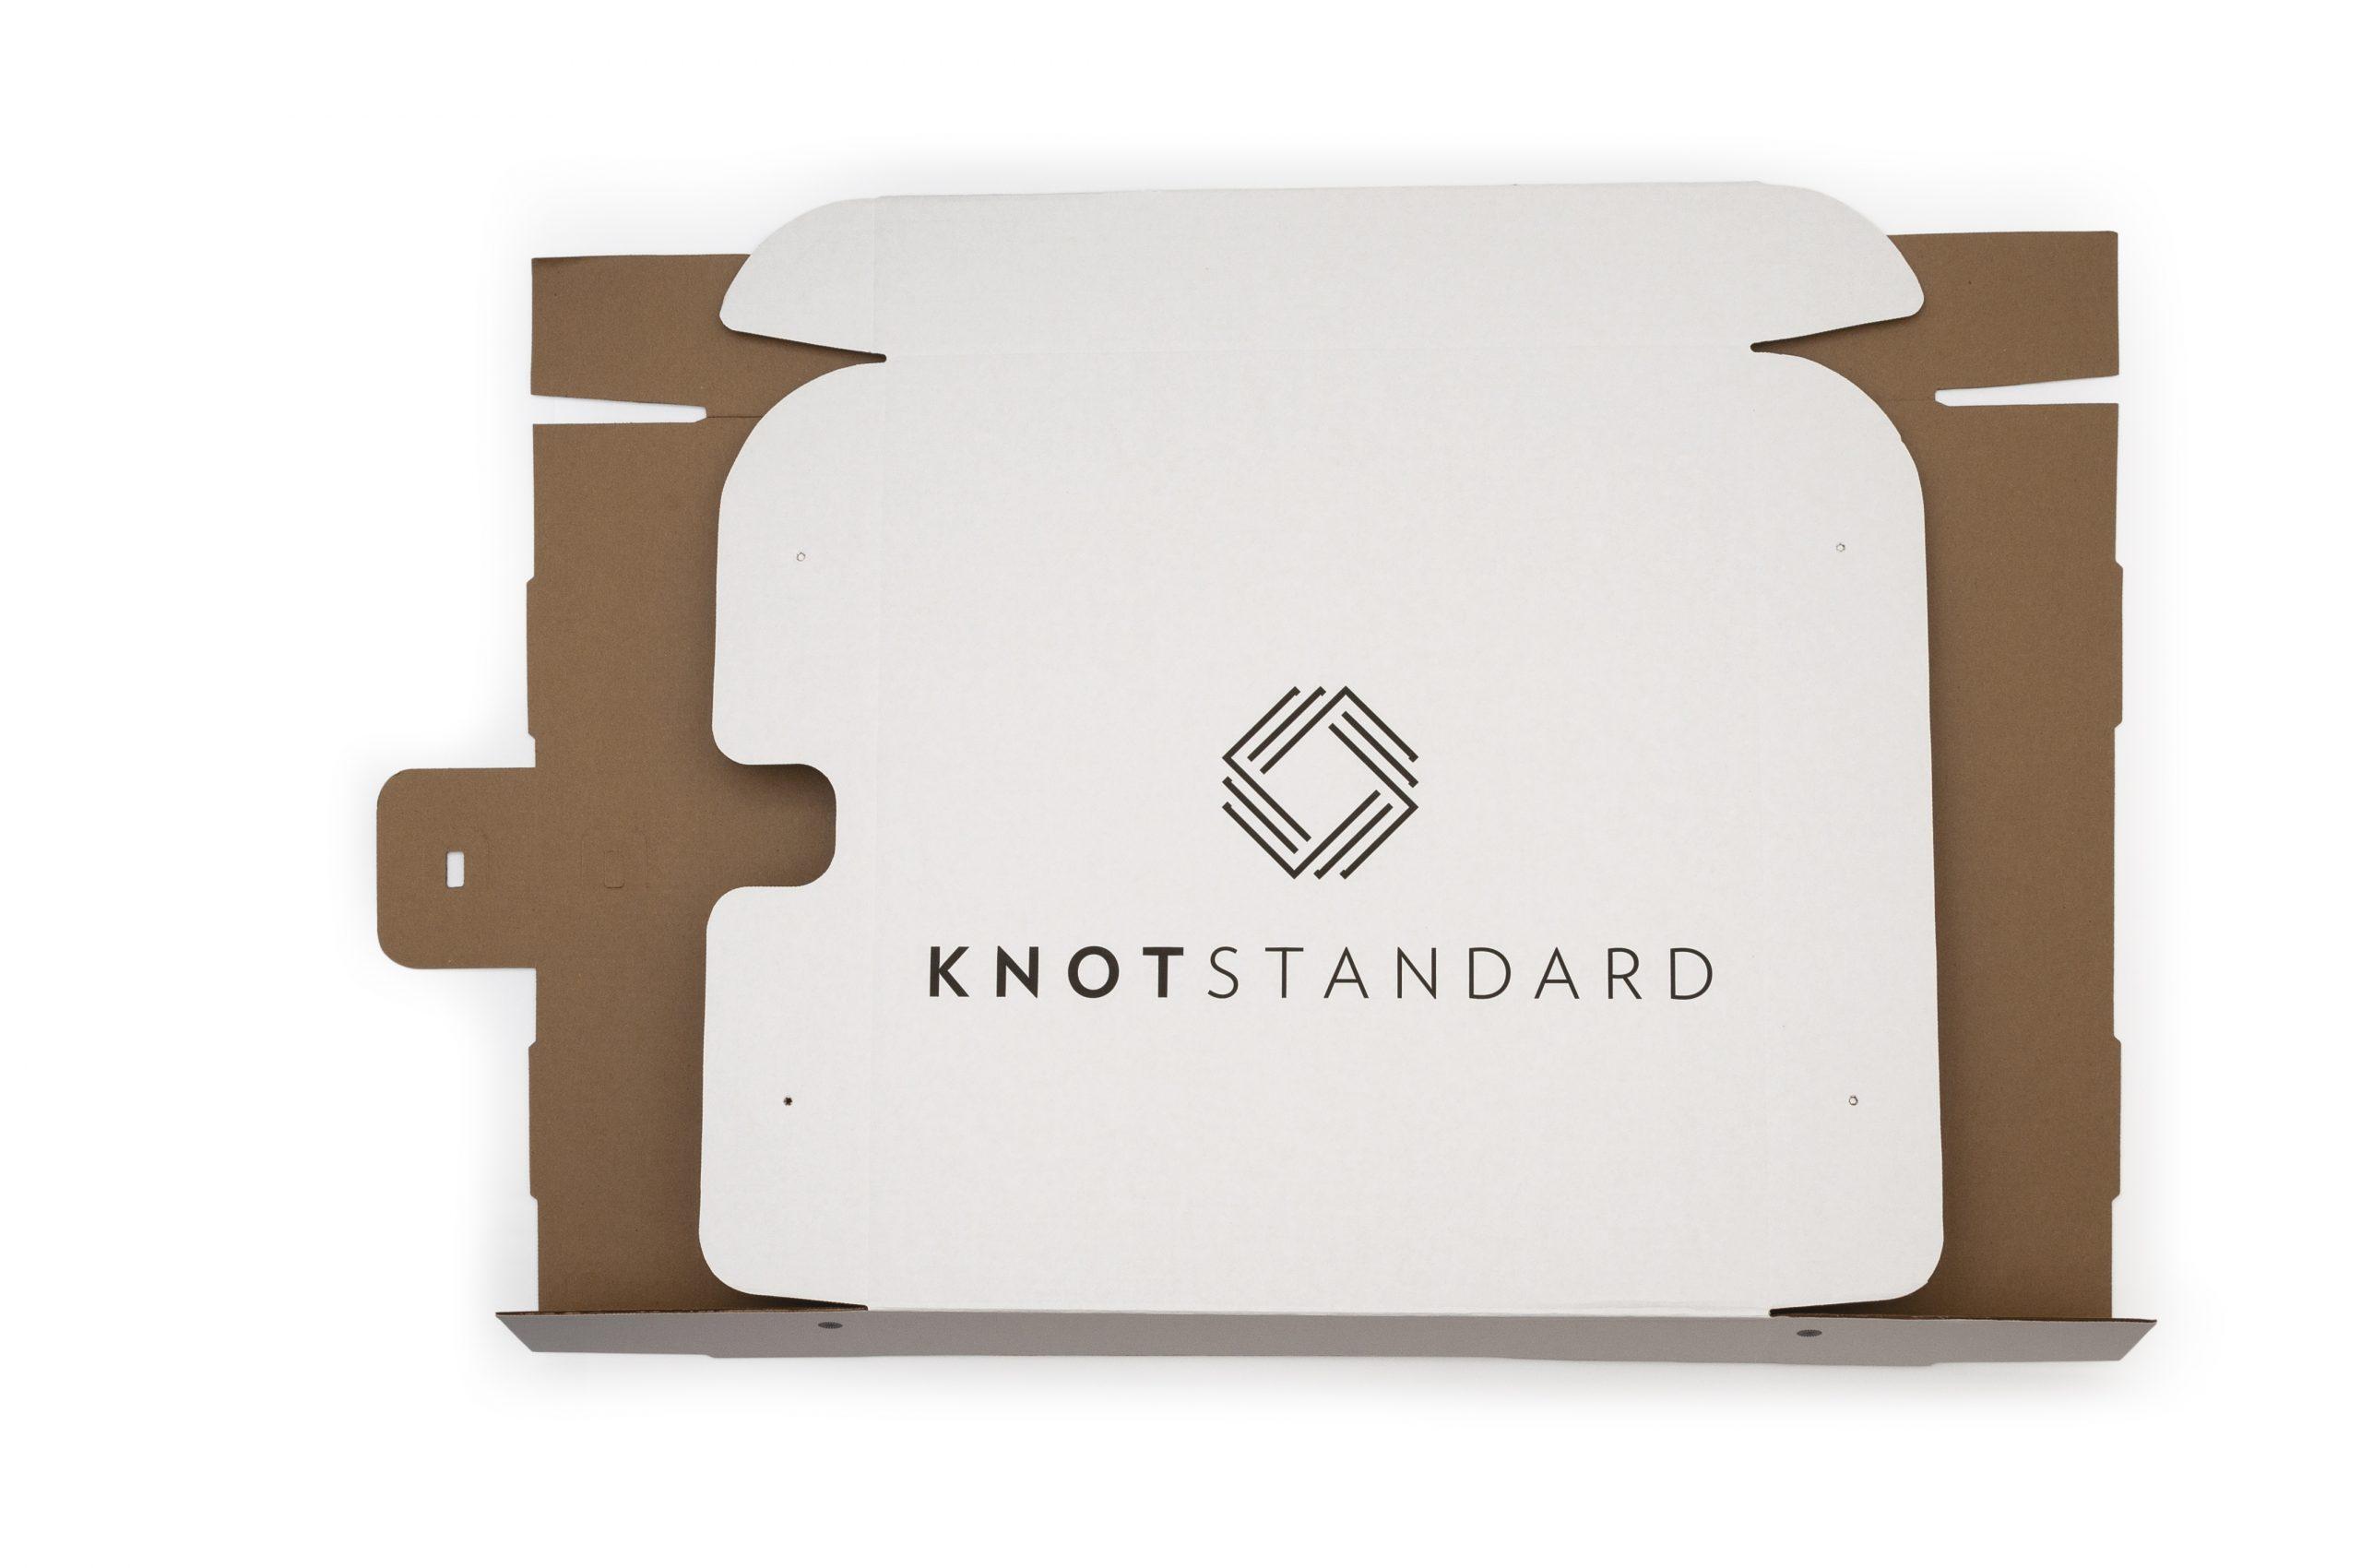 Bespoke Custom Packaging Design and Printing